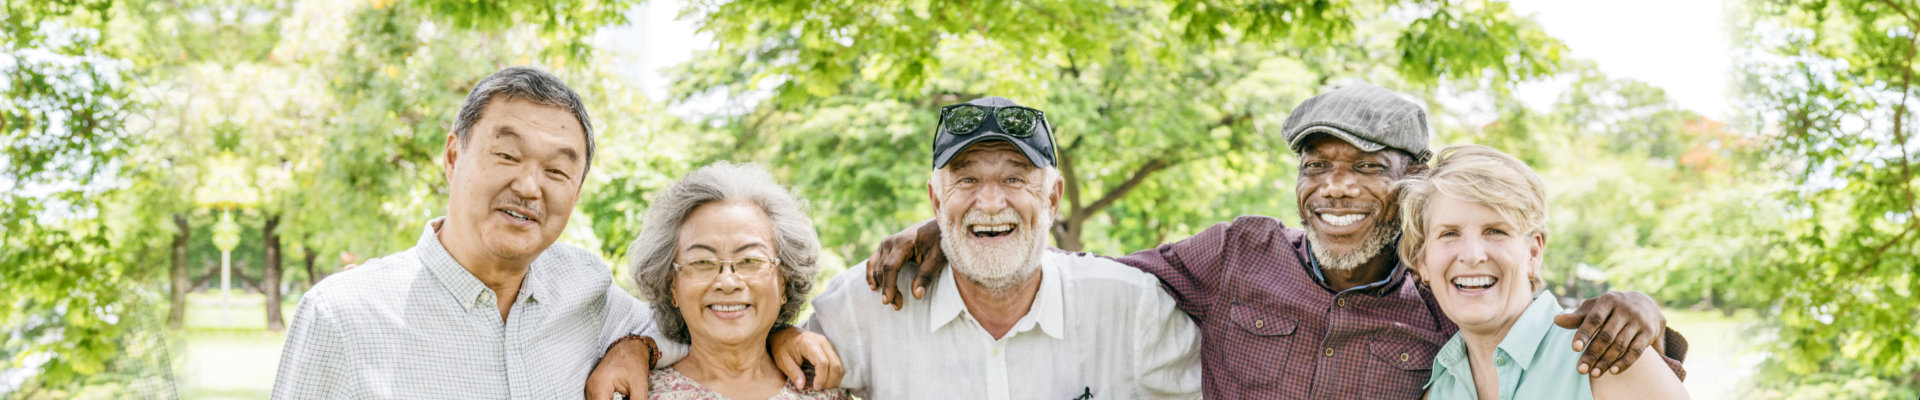 seniors enjoying the park